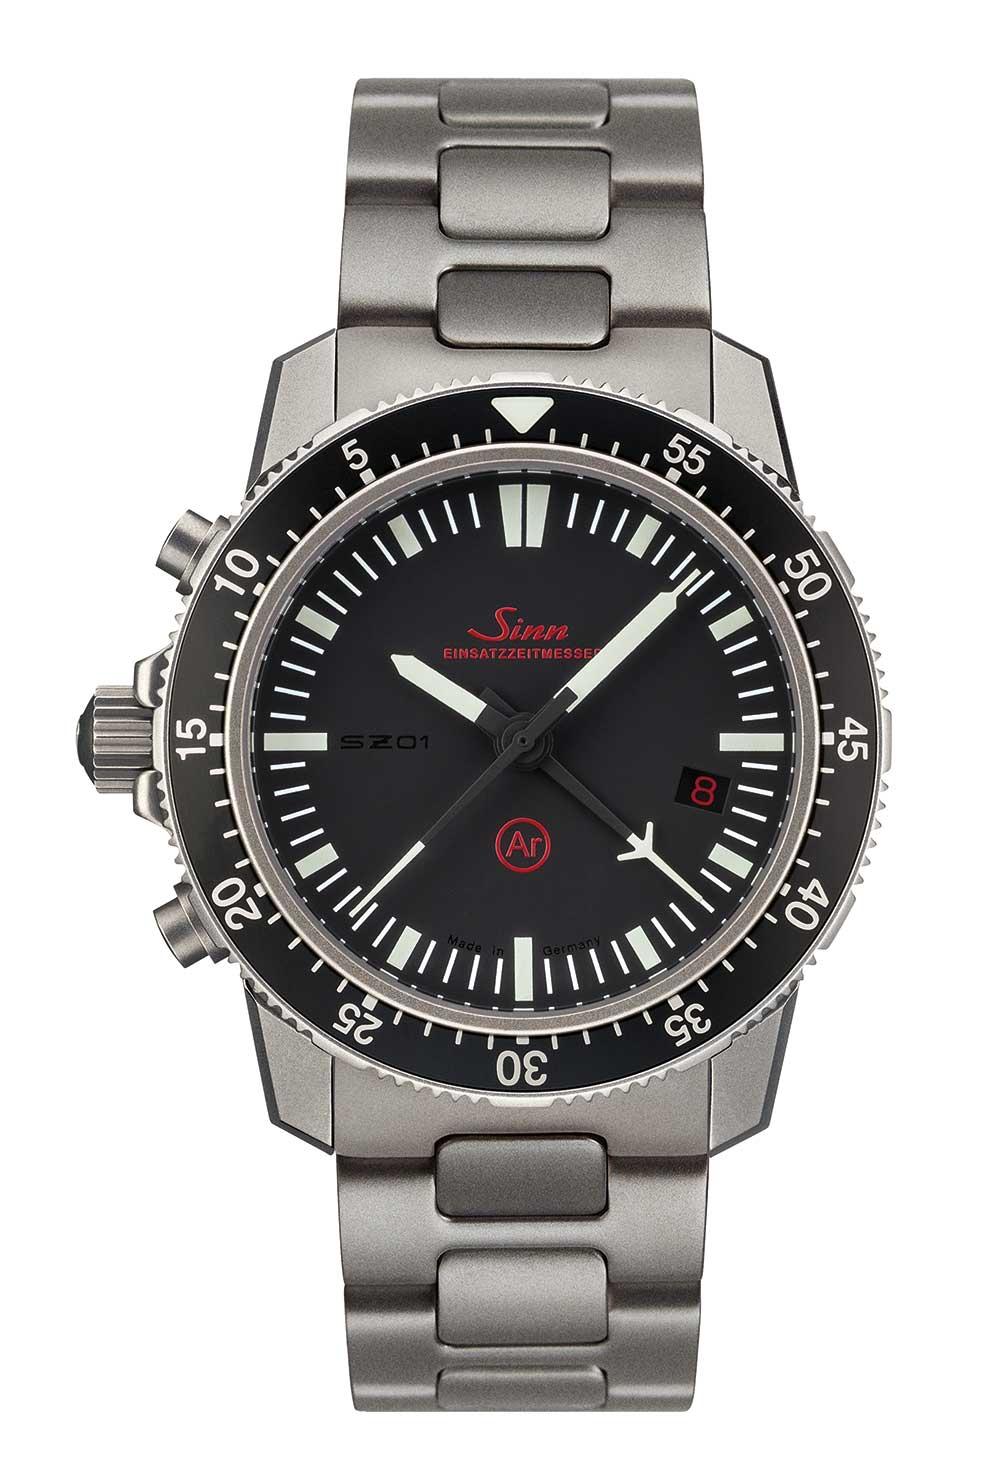 Sinn EZM 1.1 mission timer chronograph with bracelet